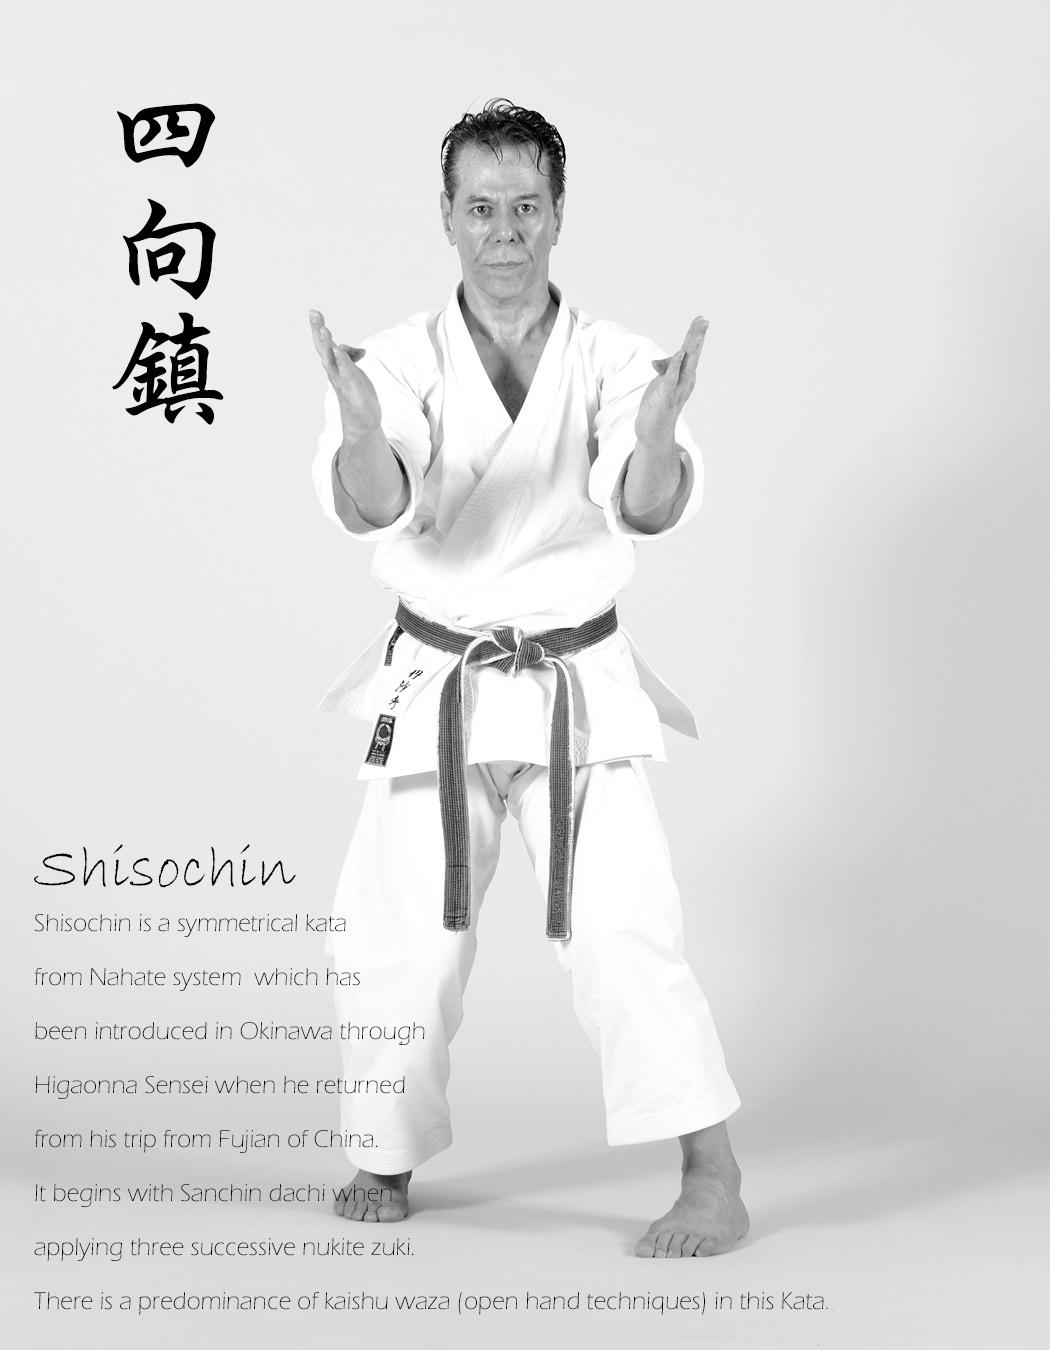 Shisochin-Kata-Tanzadeh